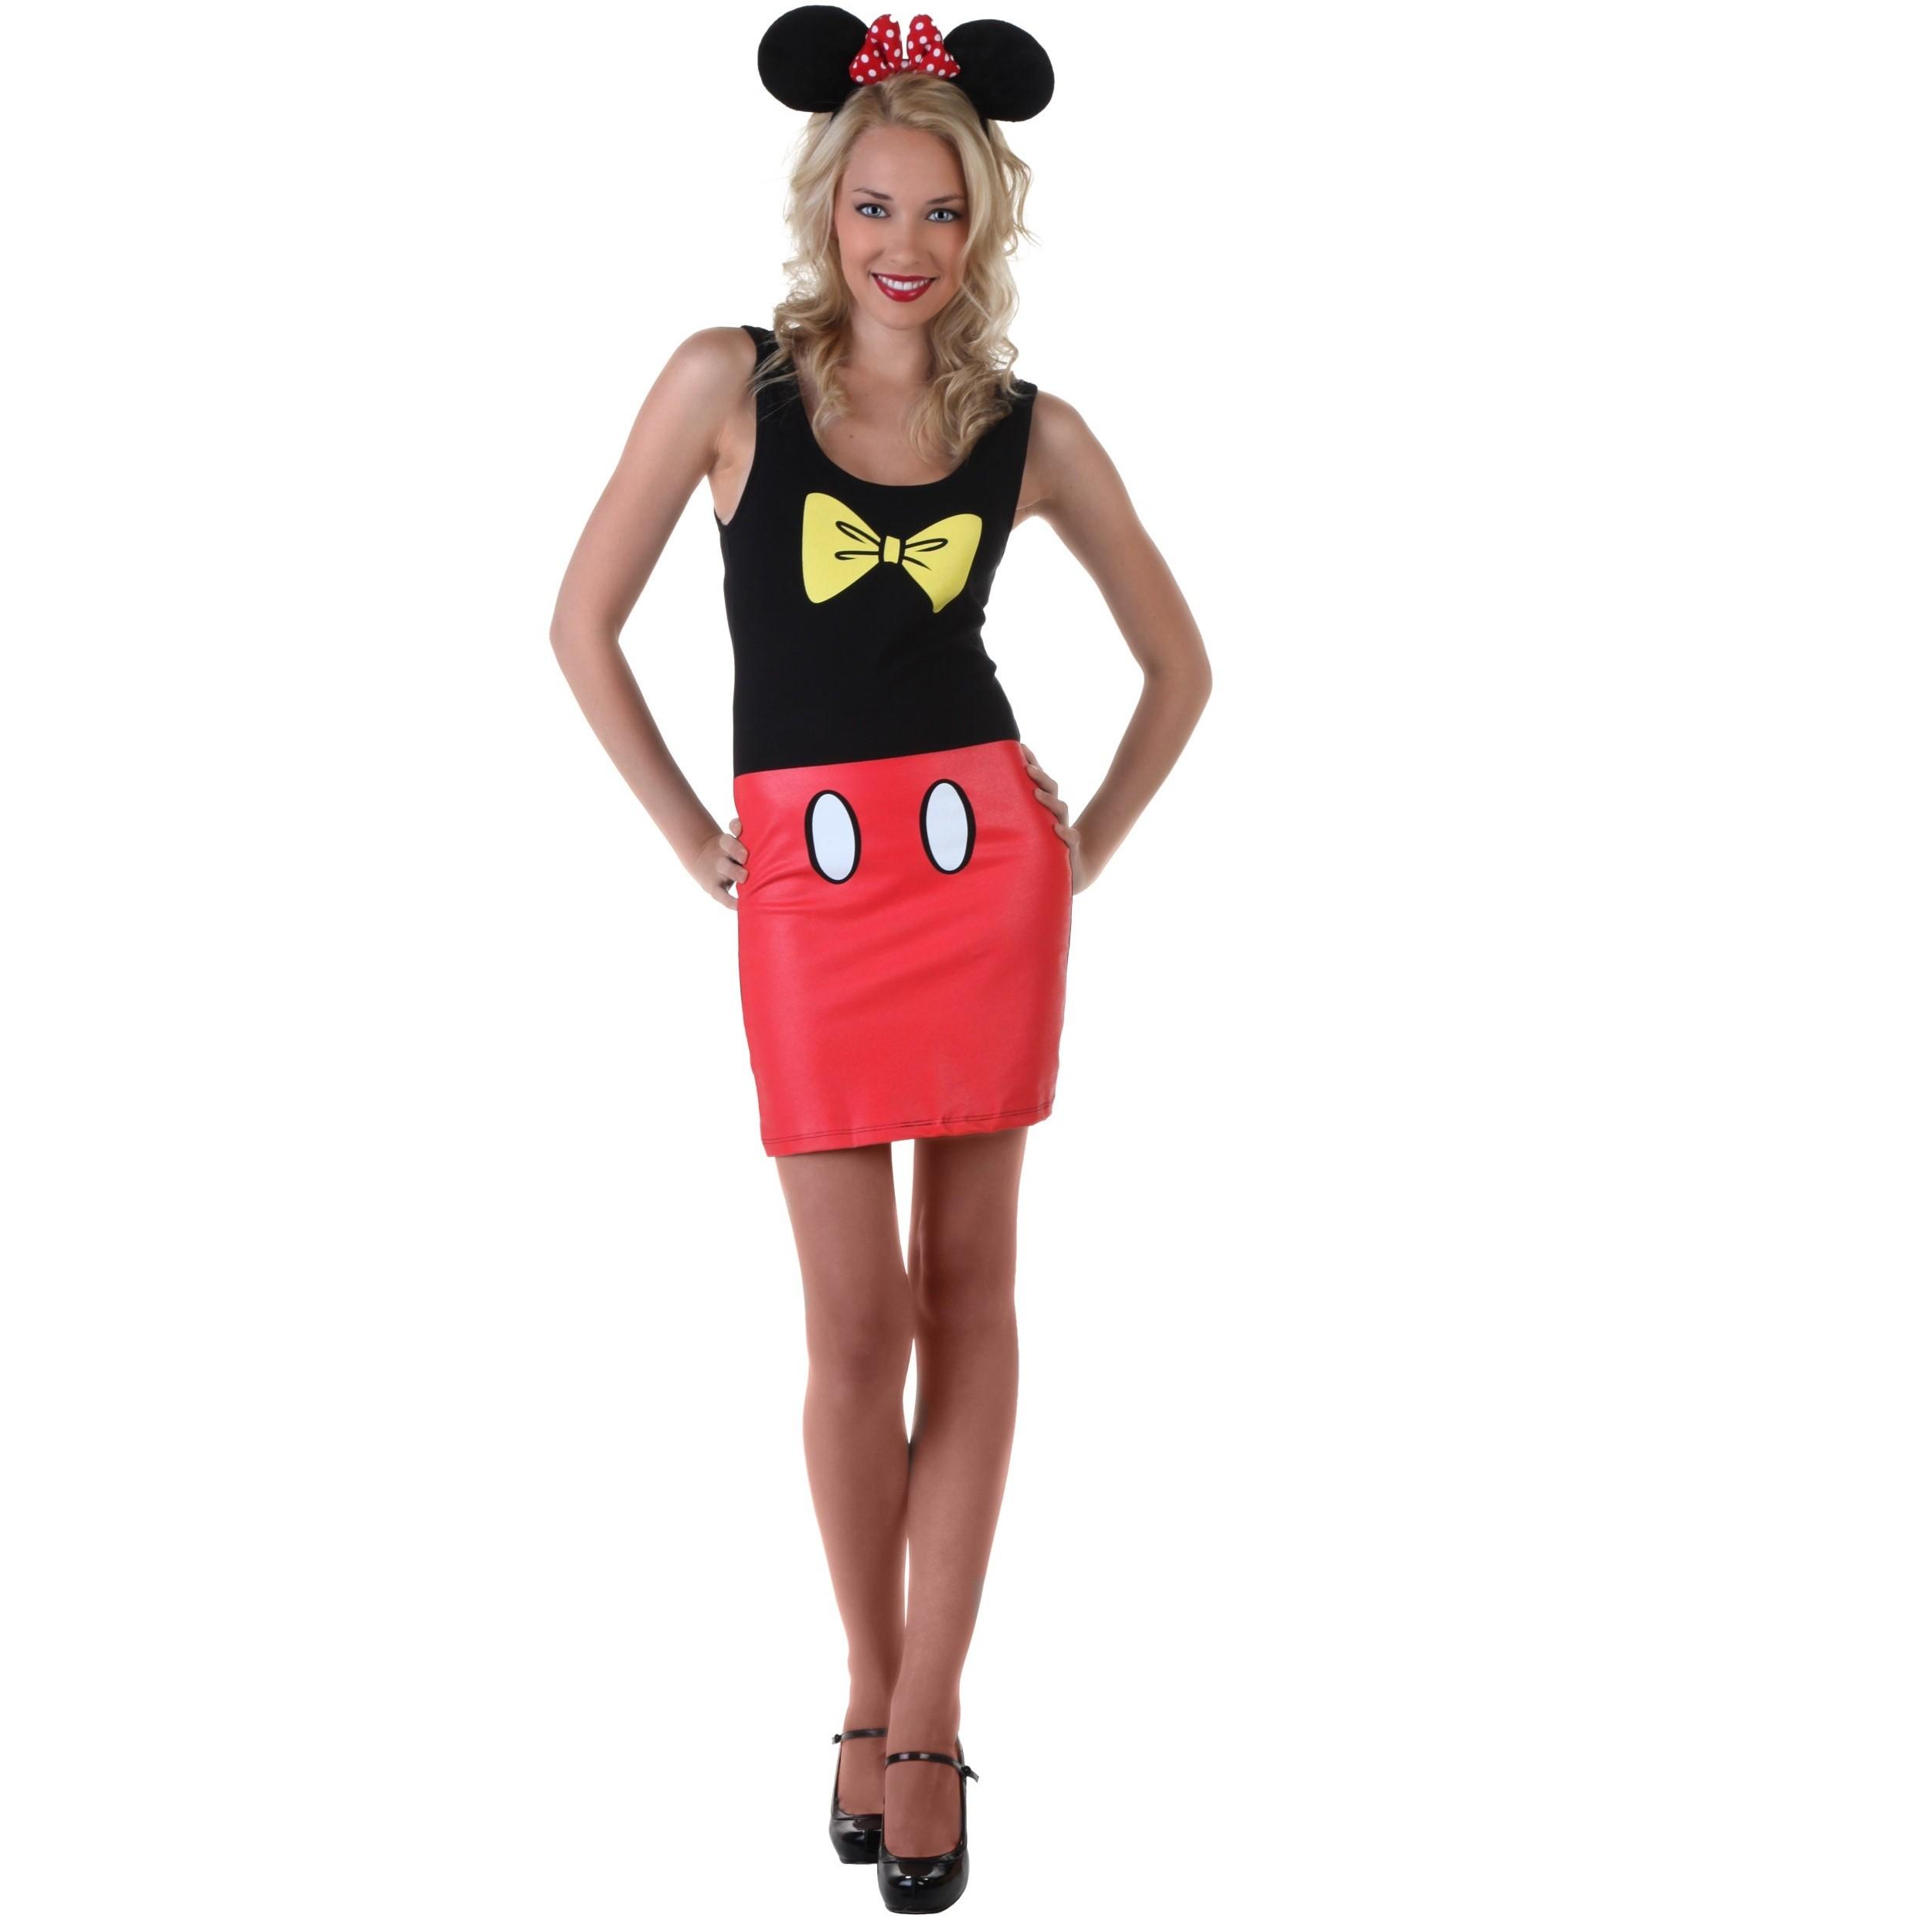 бё14.95 > http://www.pinkboutique.co.uk/shop/hey-mickey-mouse-print-mini-dress xx #mickeymouse #disney #mickey #dress #mididress #dresses #fashion #style